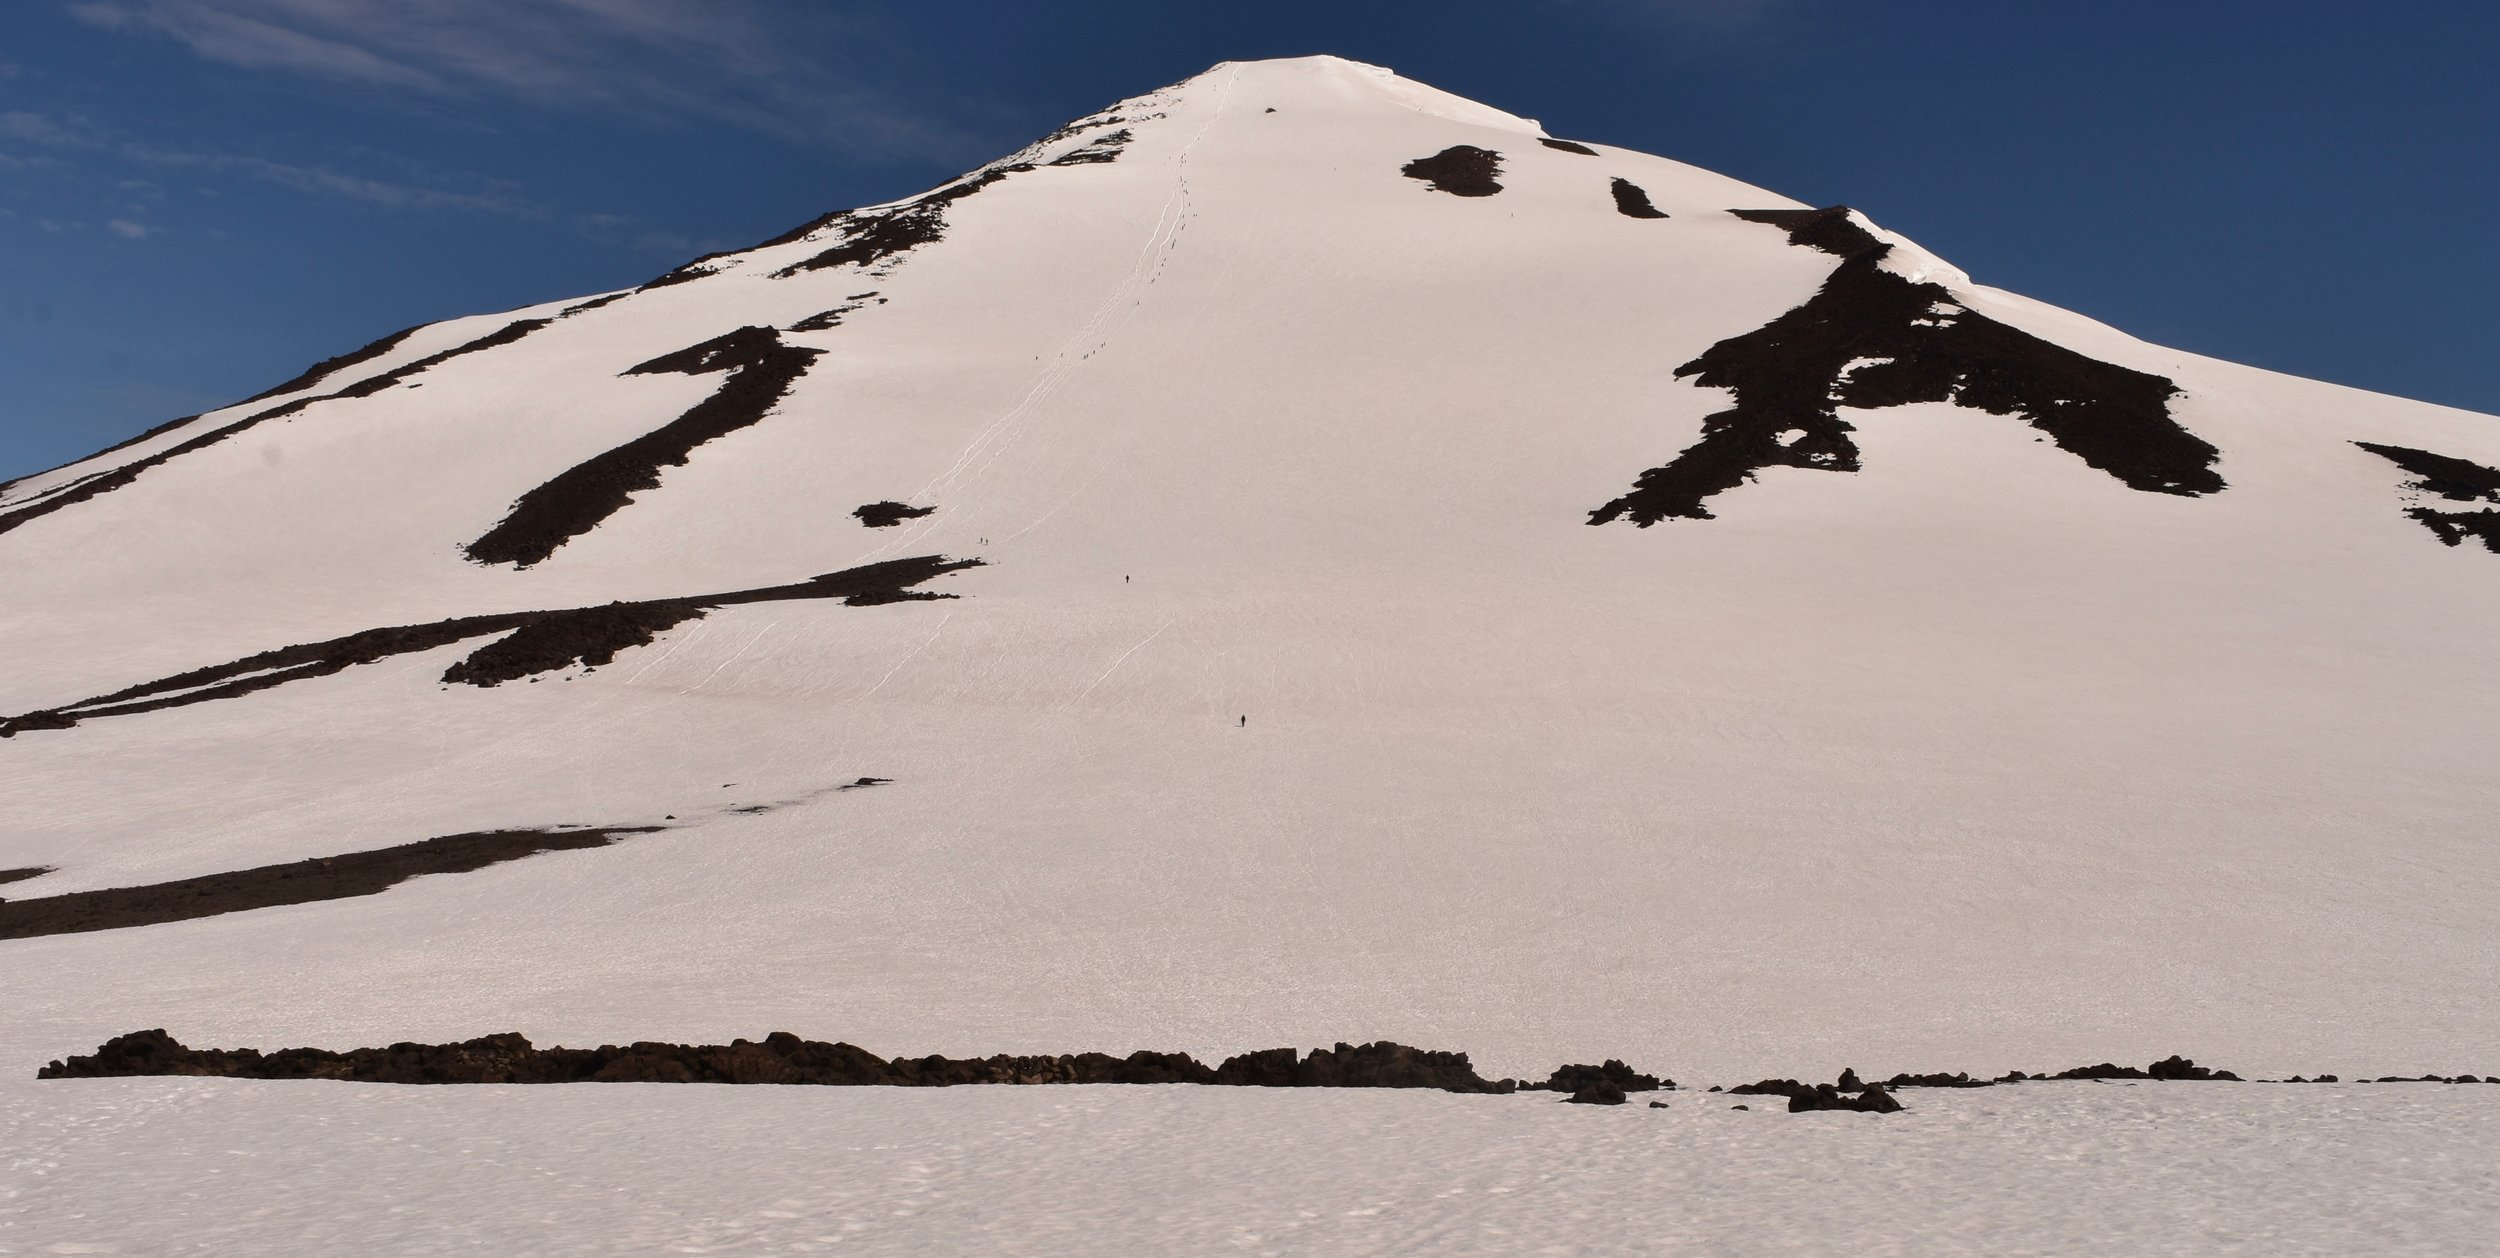 2,000ft climb up to Piker's Peak